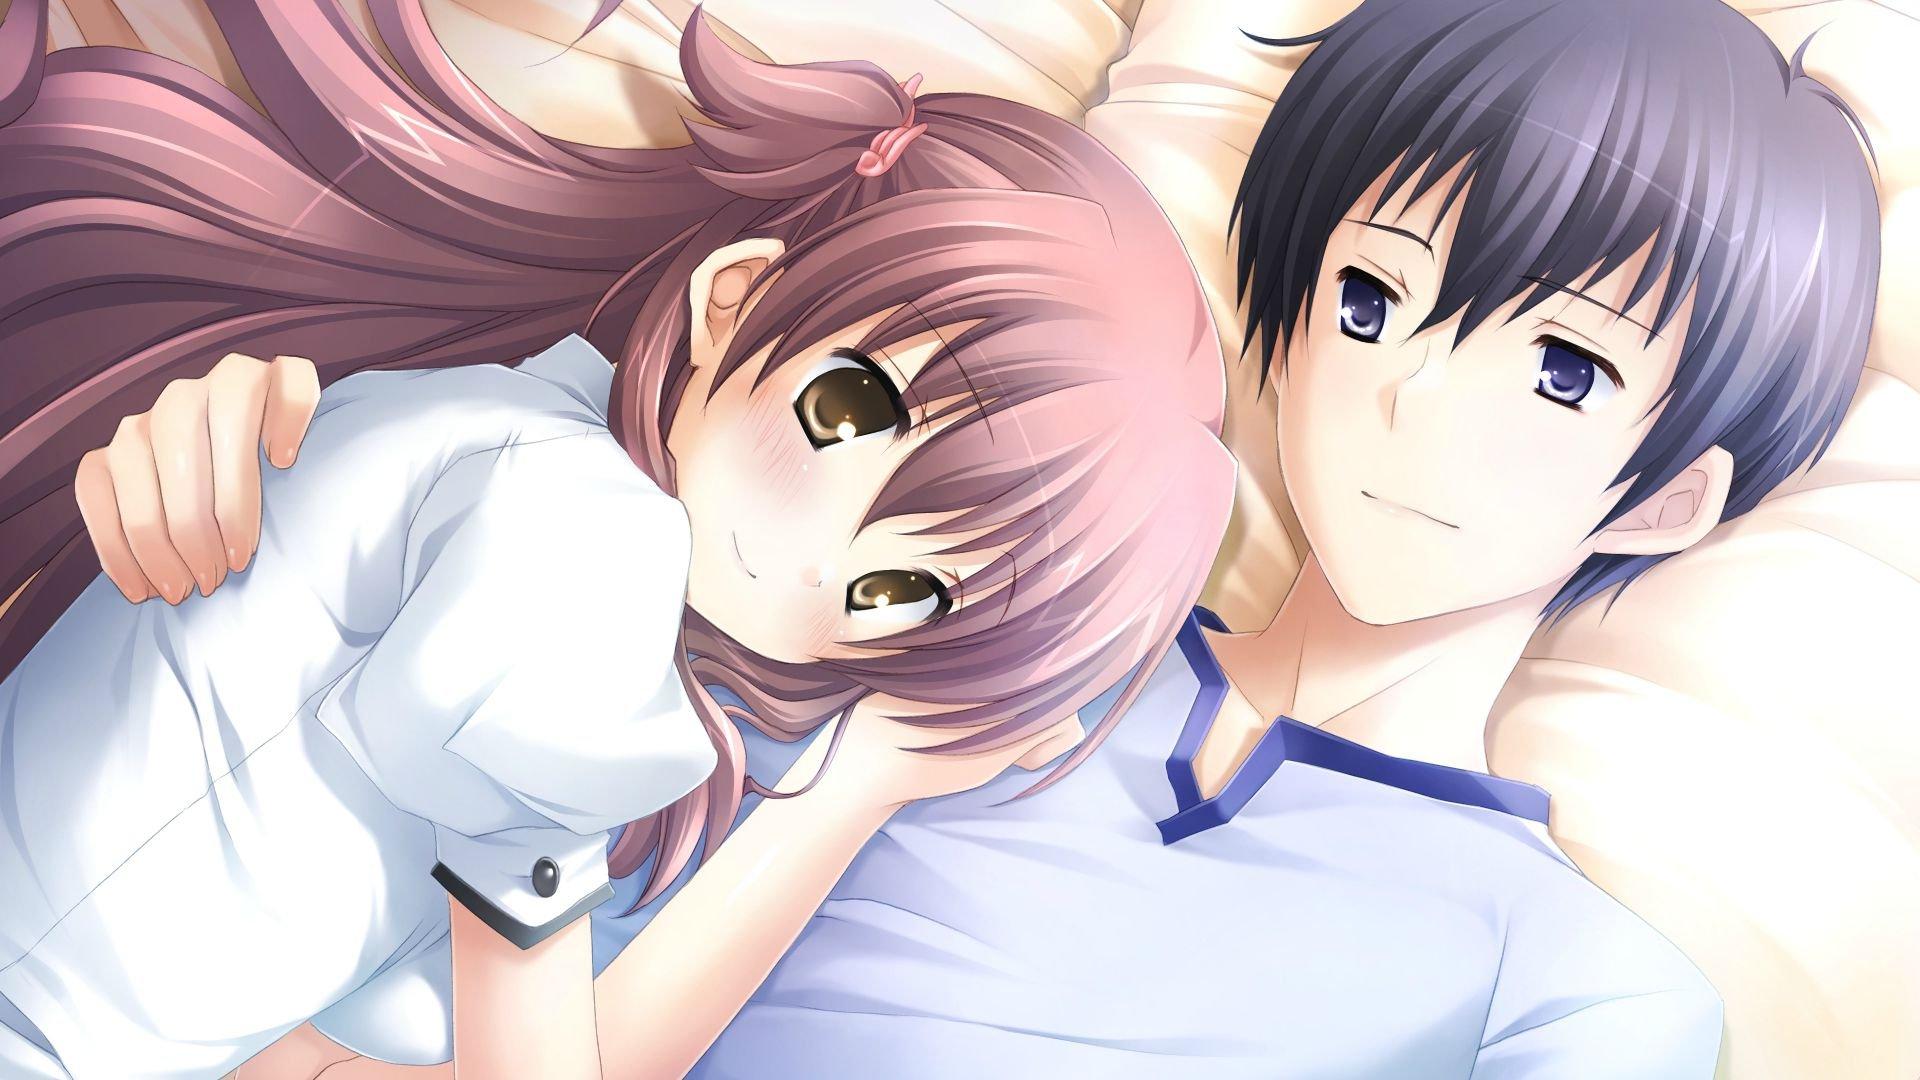 boy hugging Anime girl